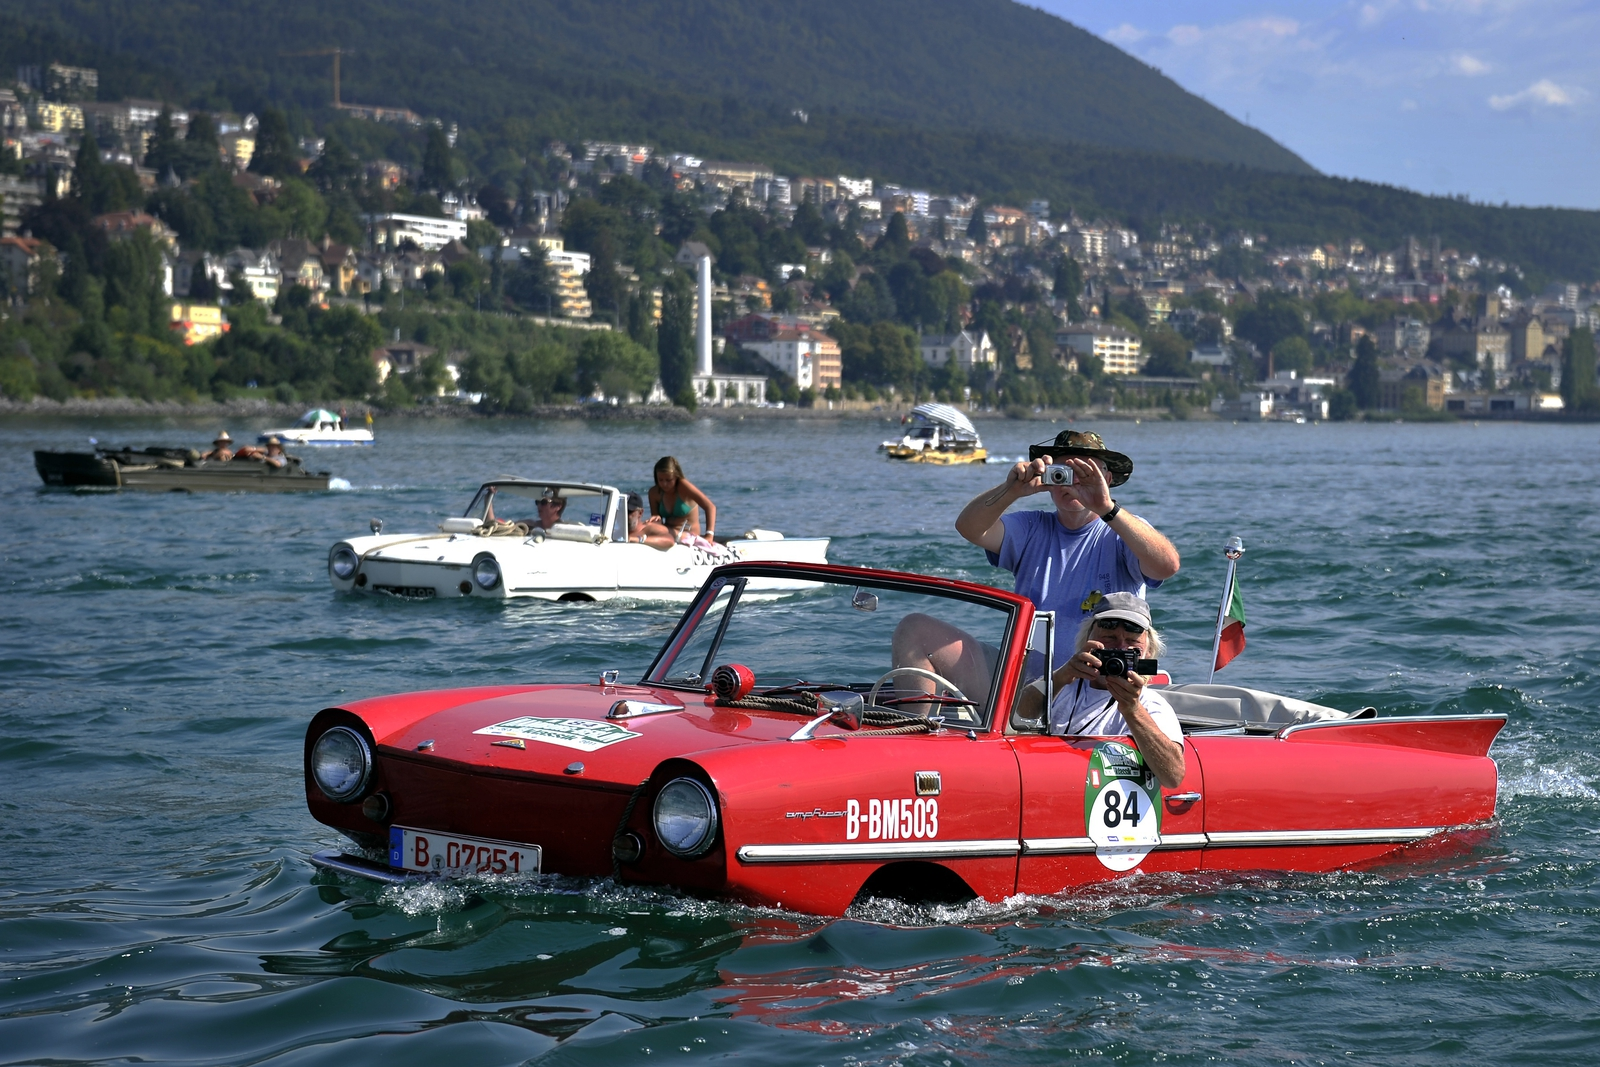 Image - Amphibious cars motor across Lake Neuchatel in 2011